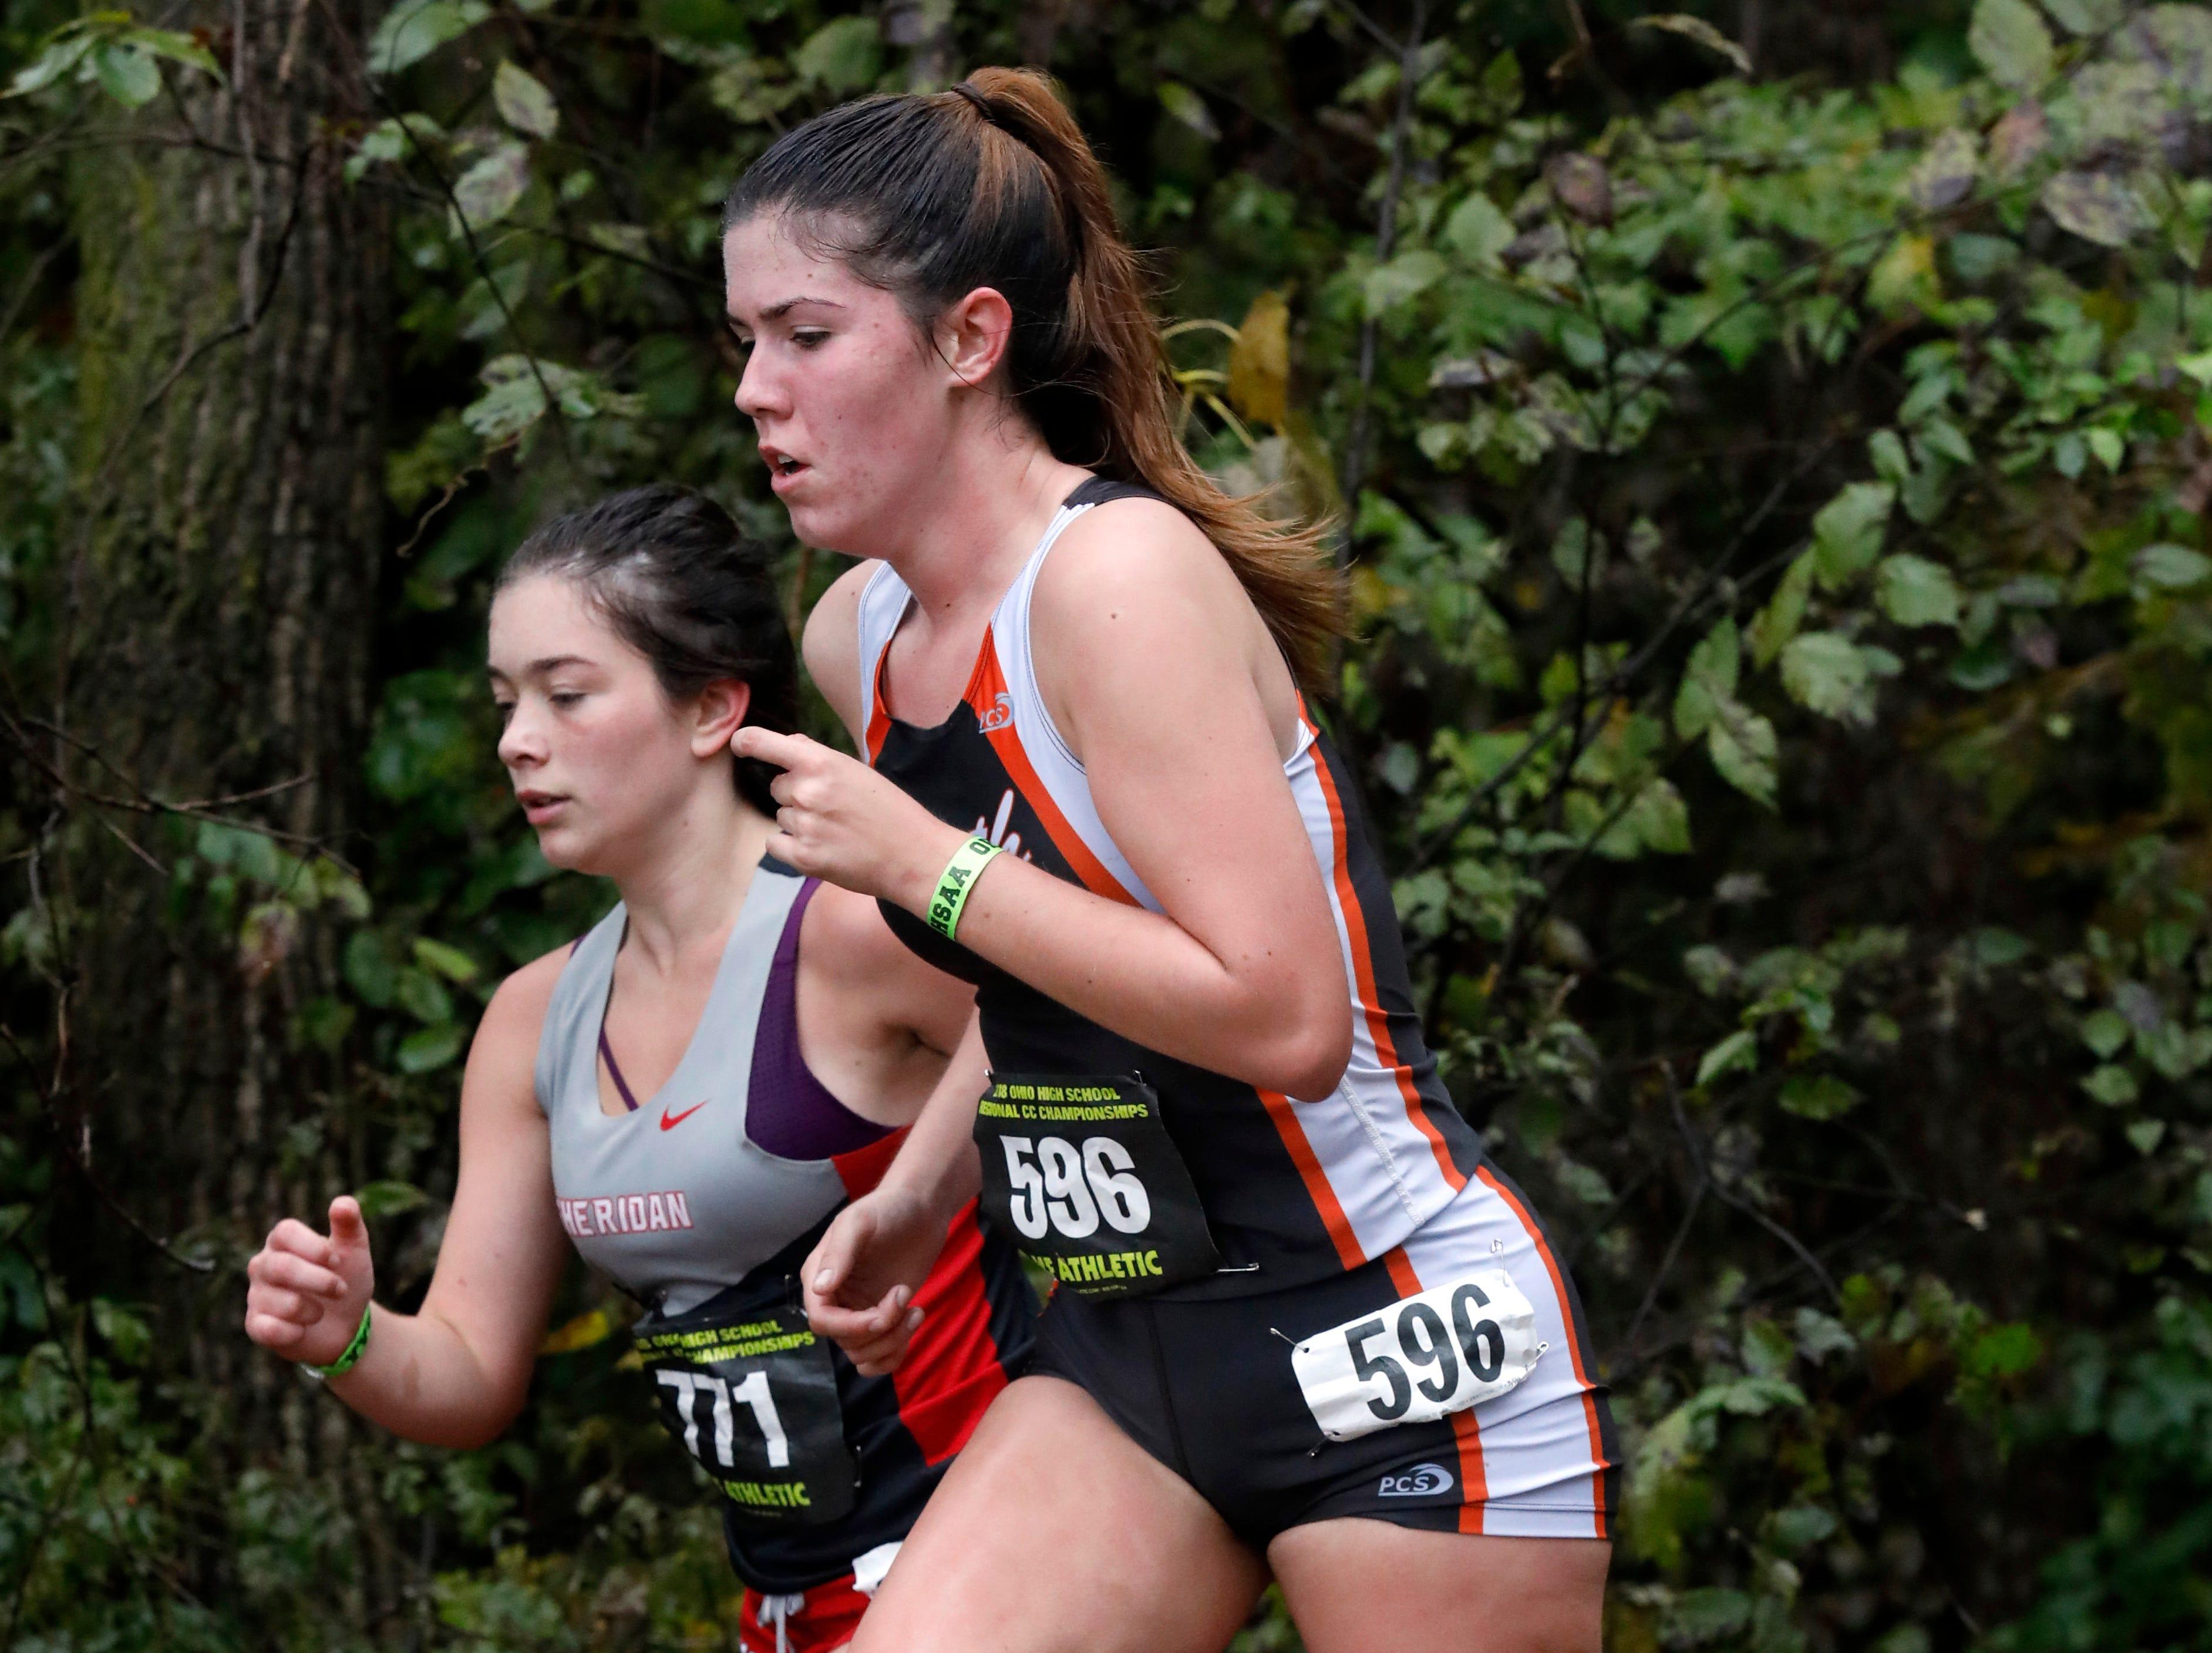 Sheridan's Ondrianna Nihiser, left, and Heath's Haylee Watson run in the Regional Cross Country meet Saturday, Oct. 27, 2018, at Pickerington North High School in Pickerington.